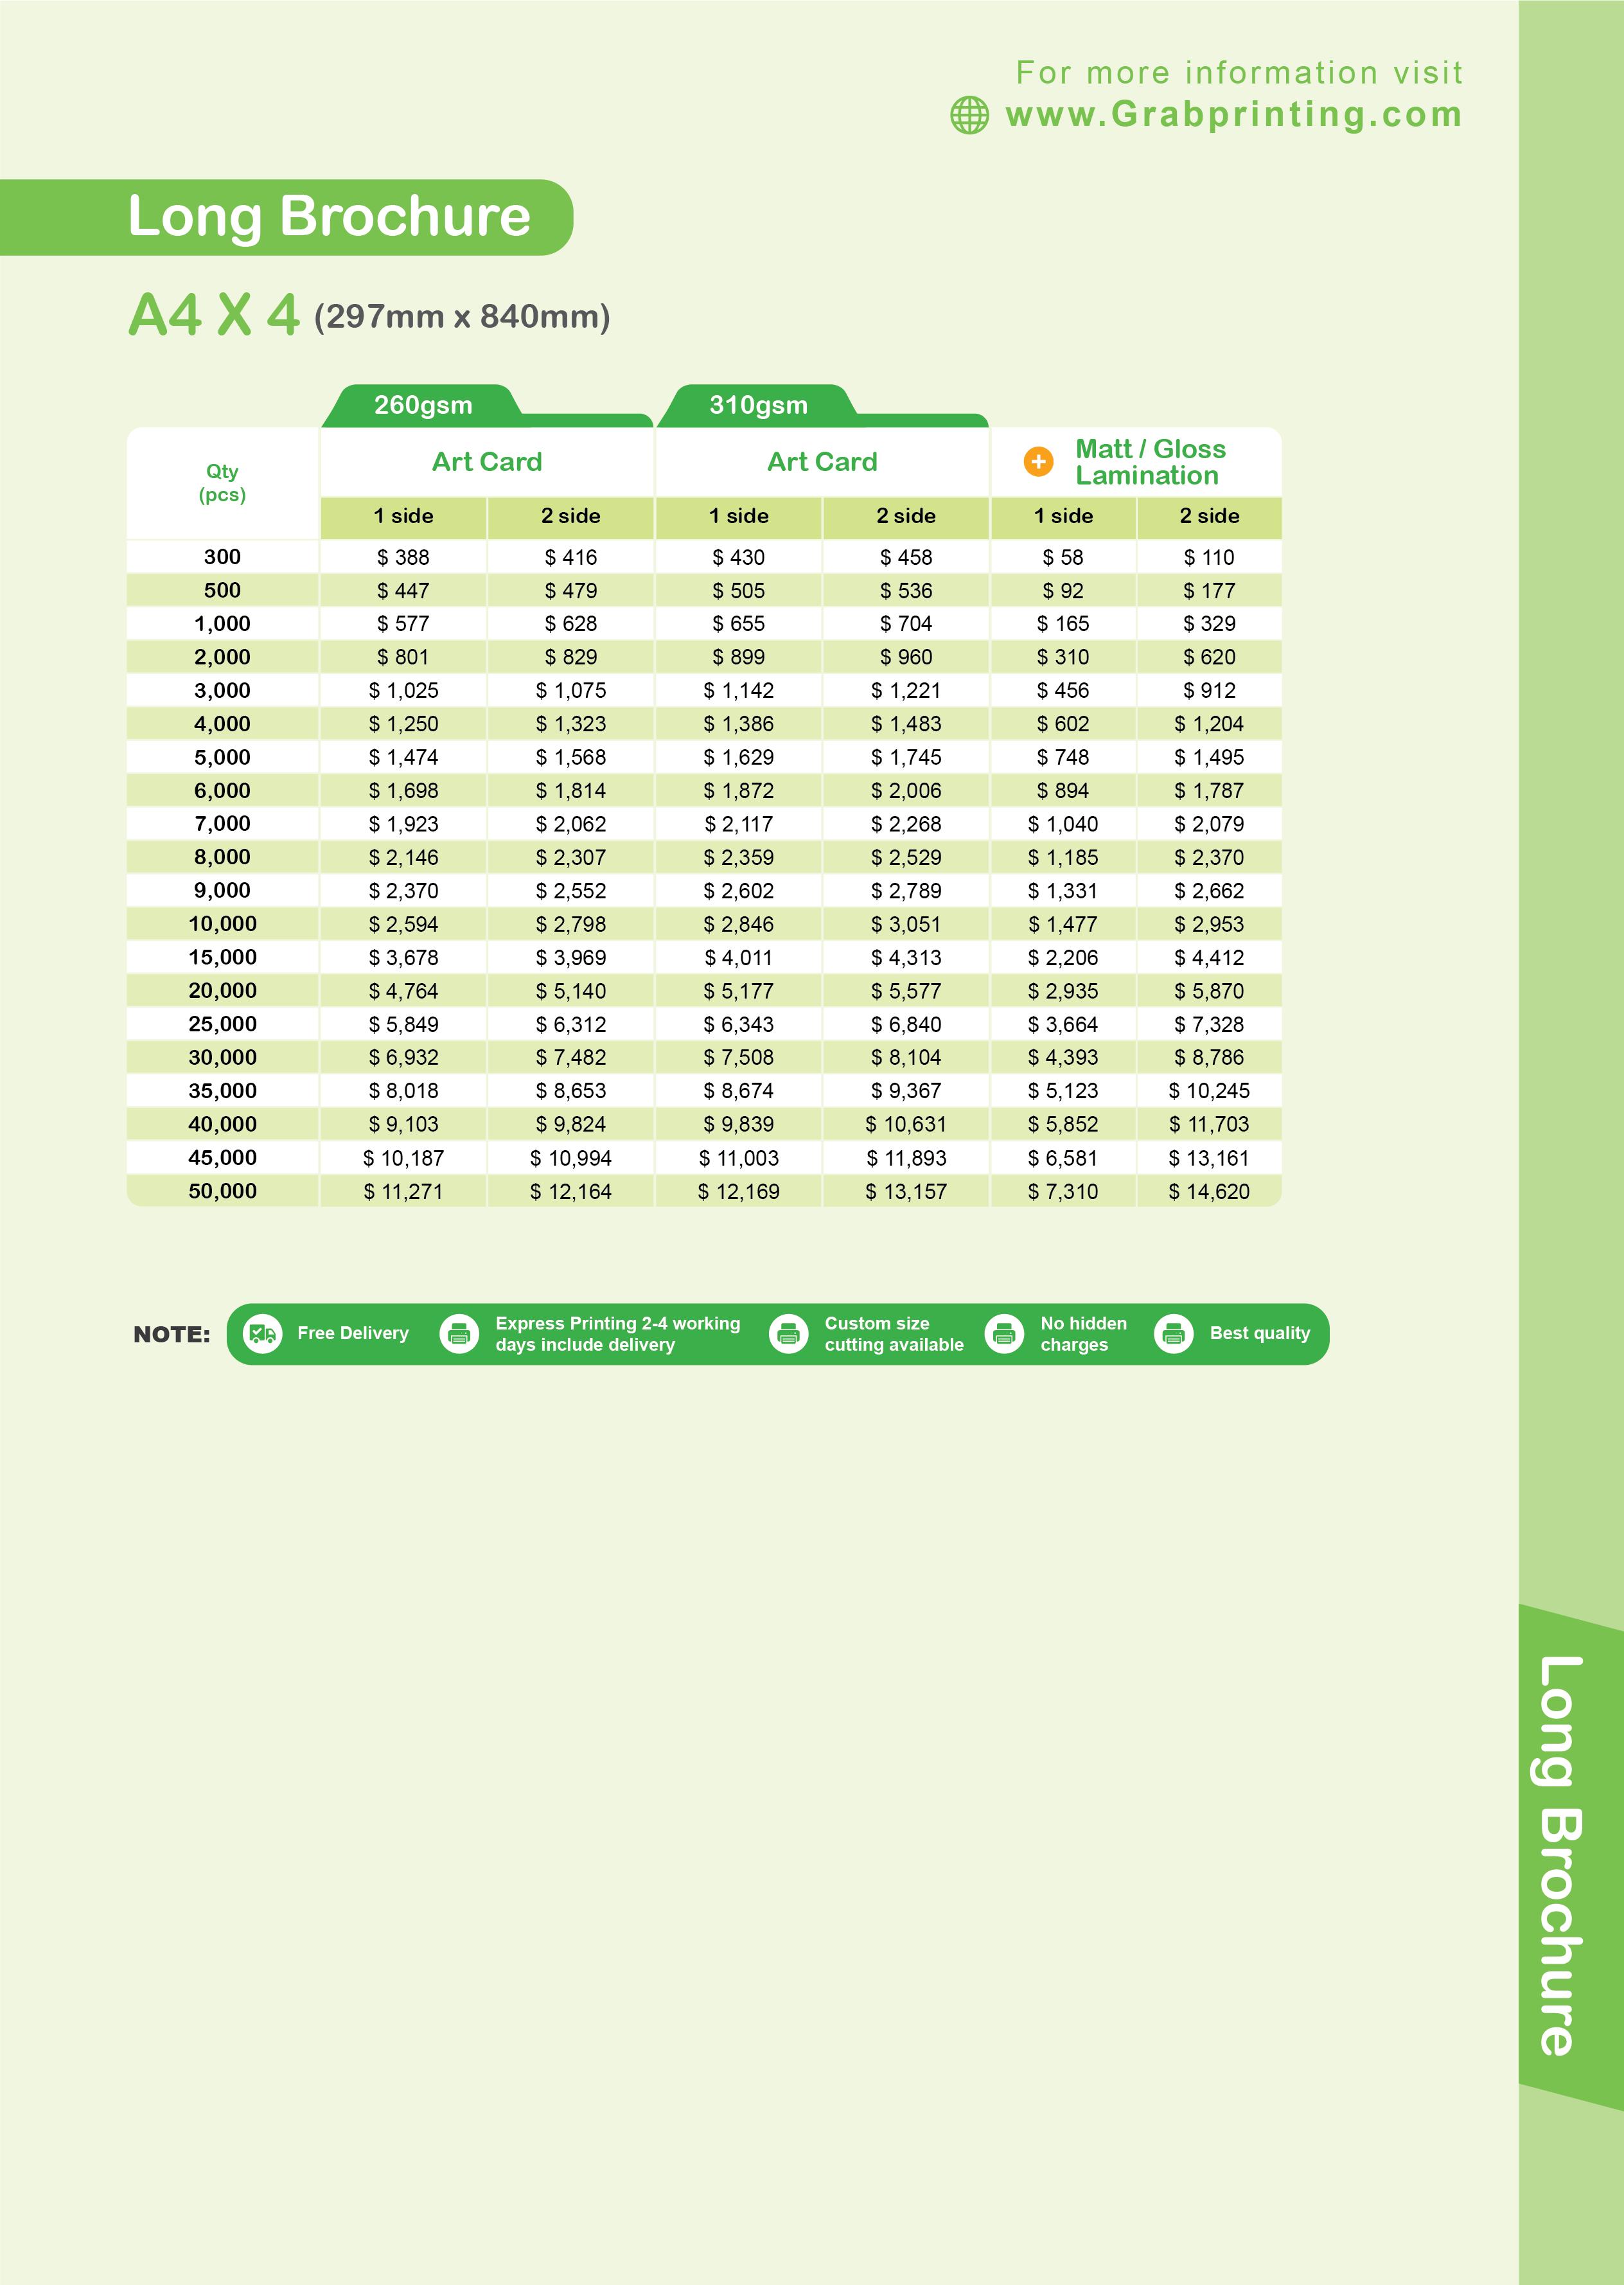 brochure printing Brochure Printing Long Brochure A4 x 4 Card Price List